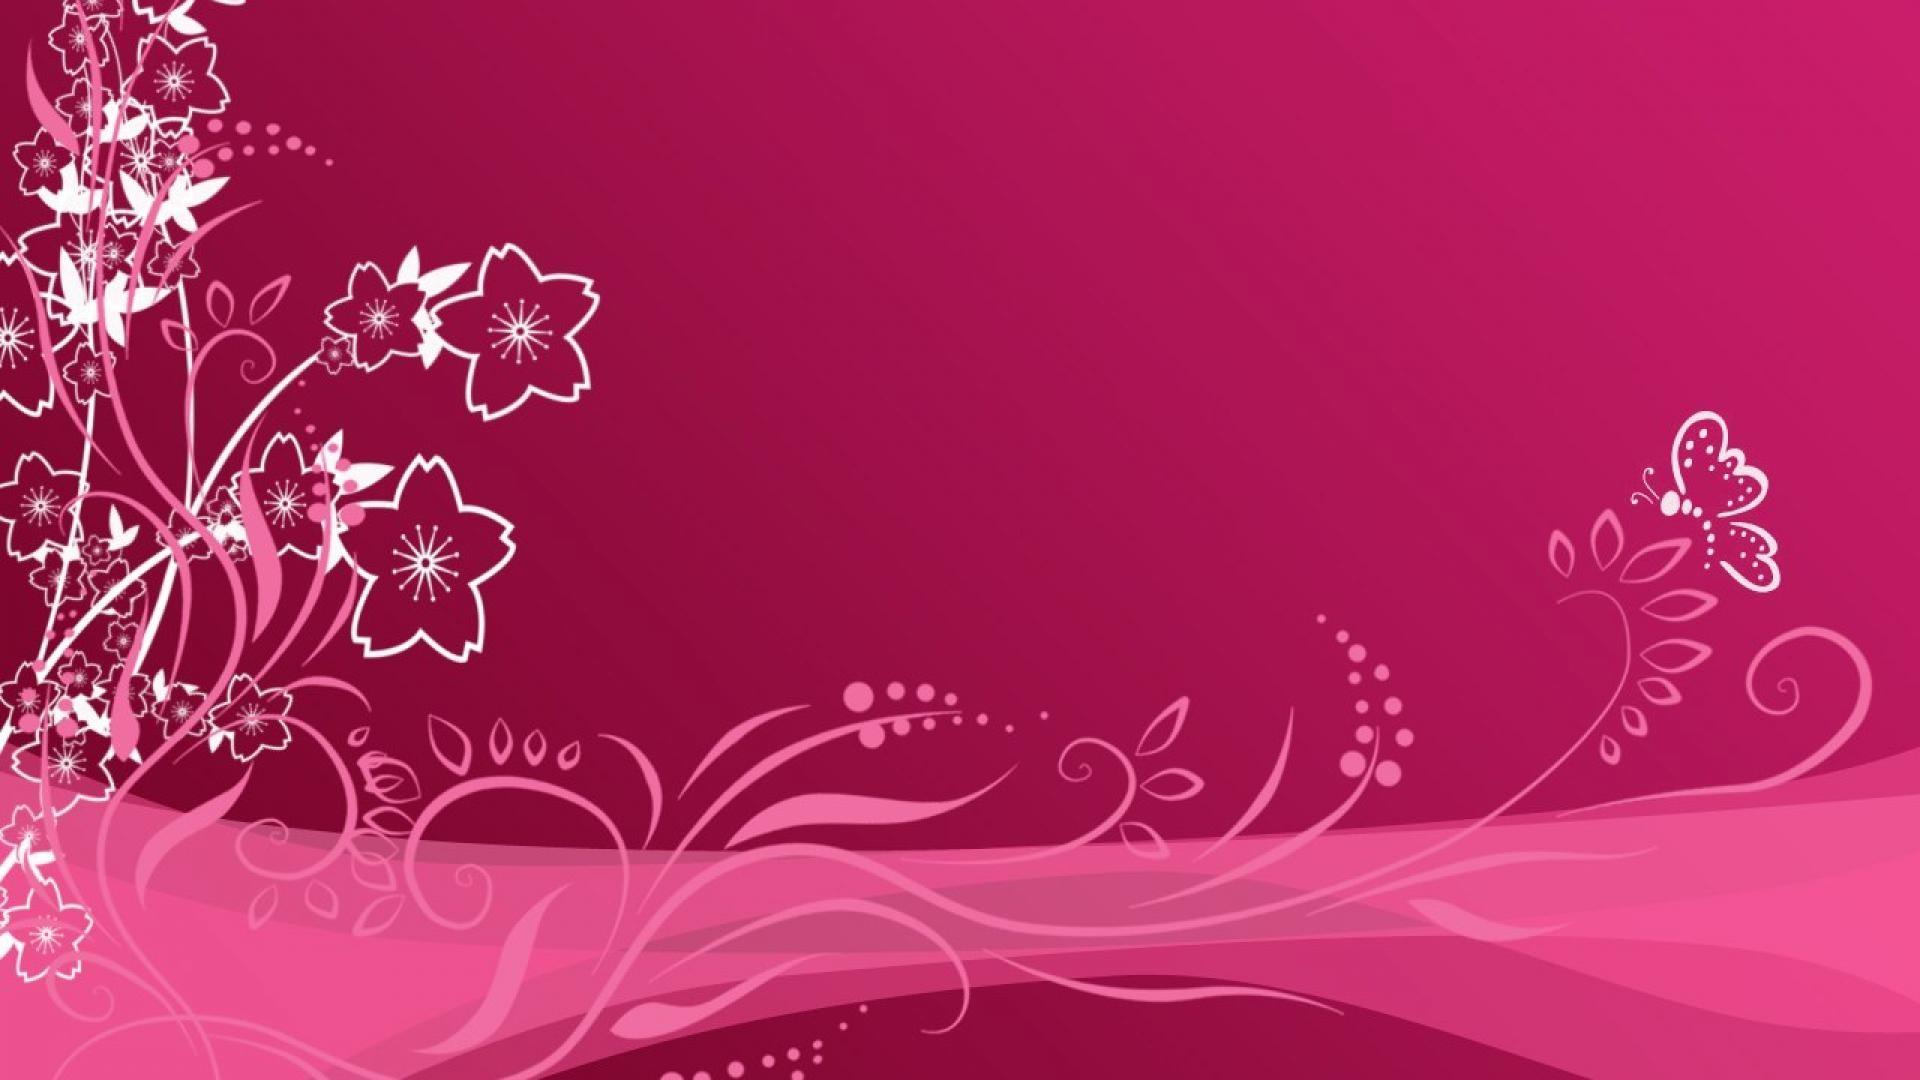 21 Cute Girly Pink Wallpaper HD